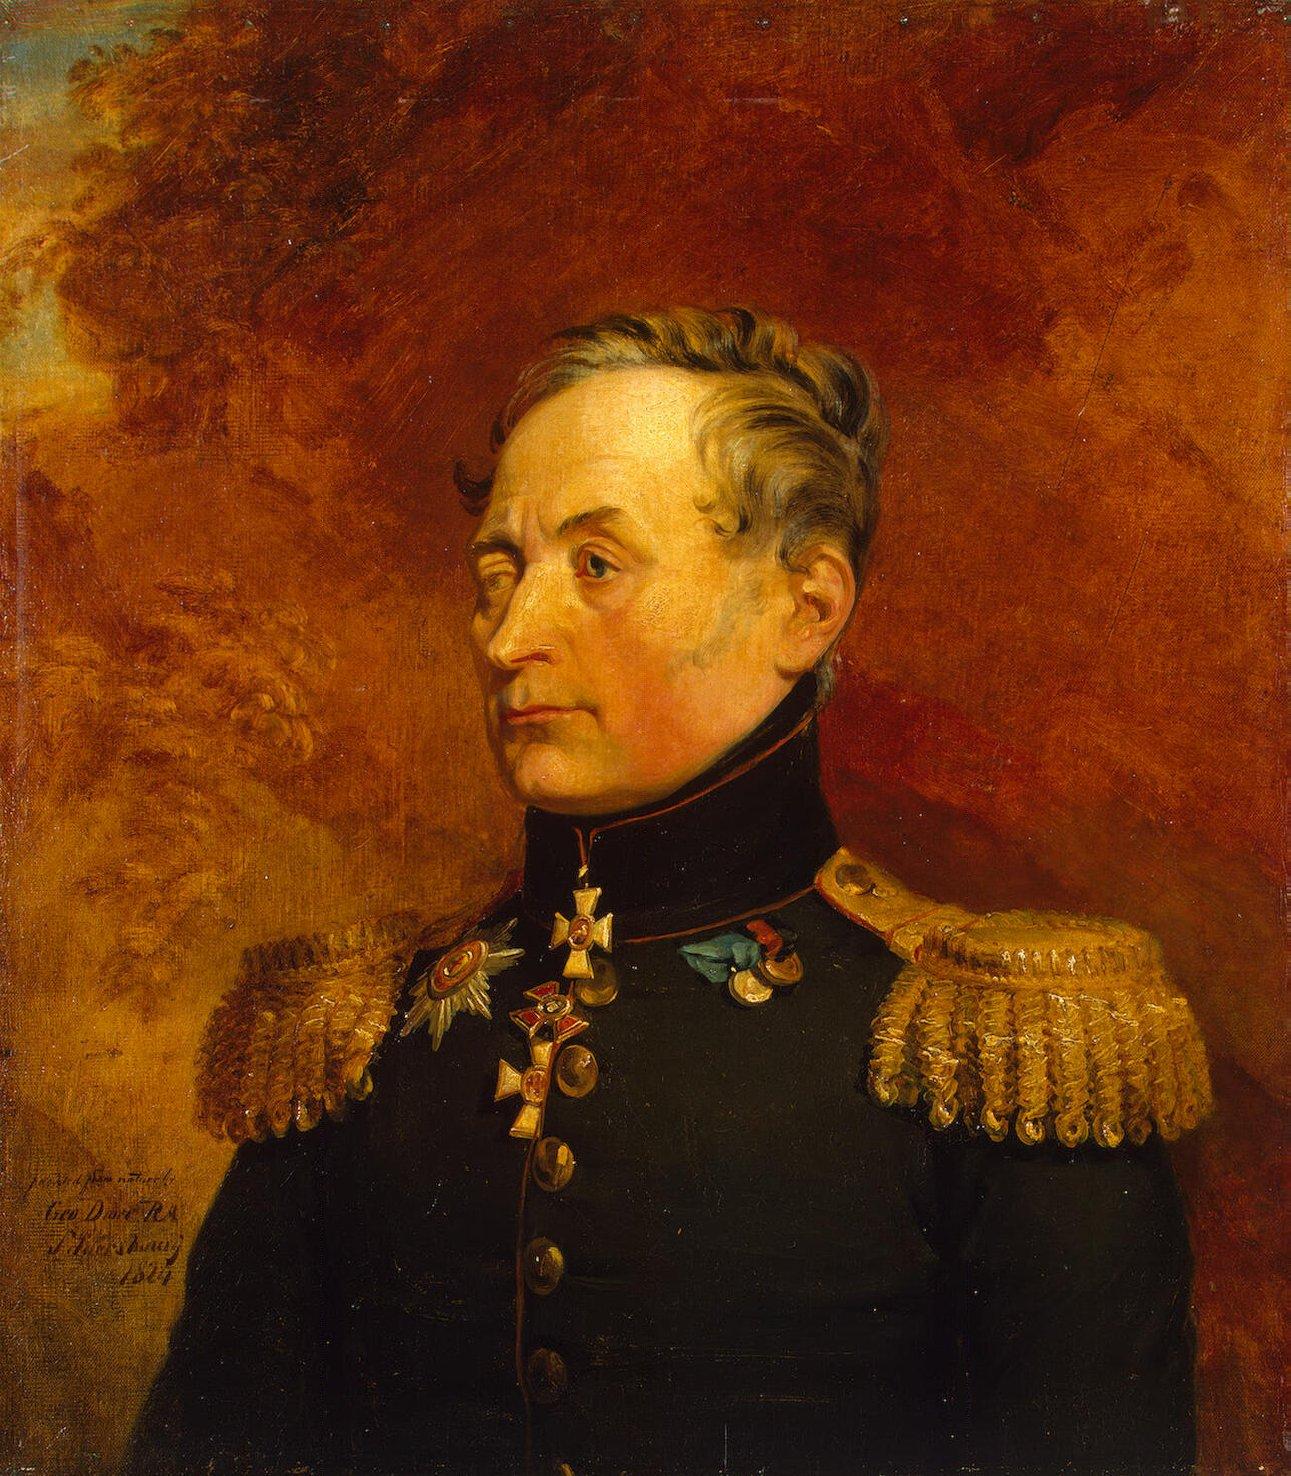 Мерлин, Павел Иванович